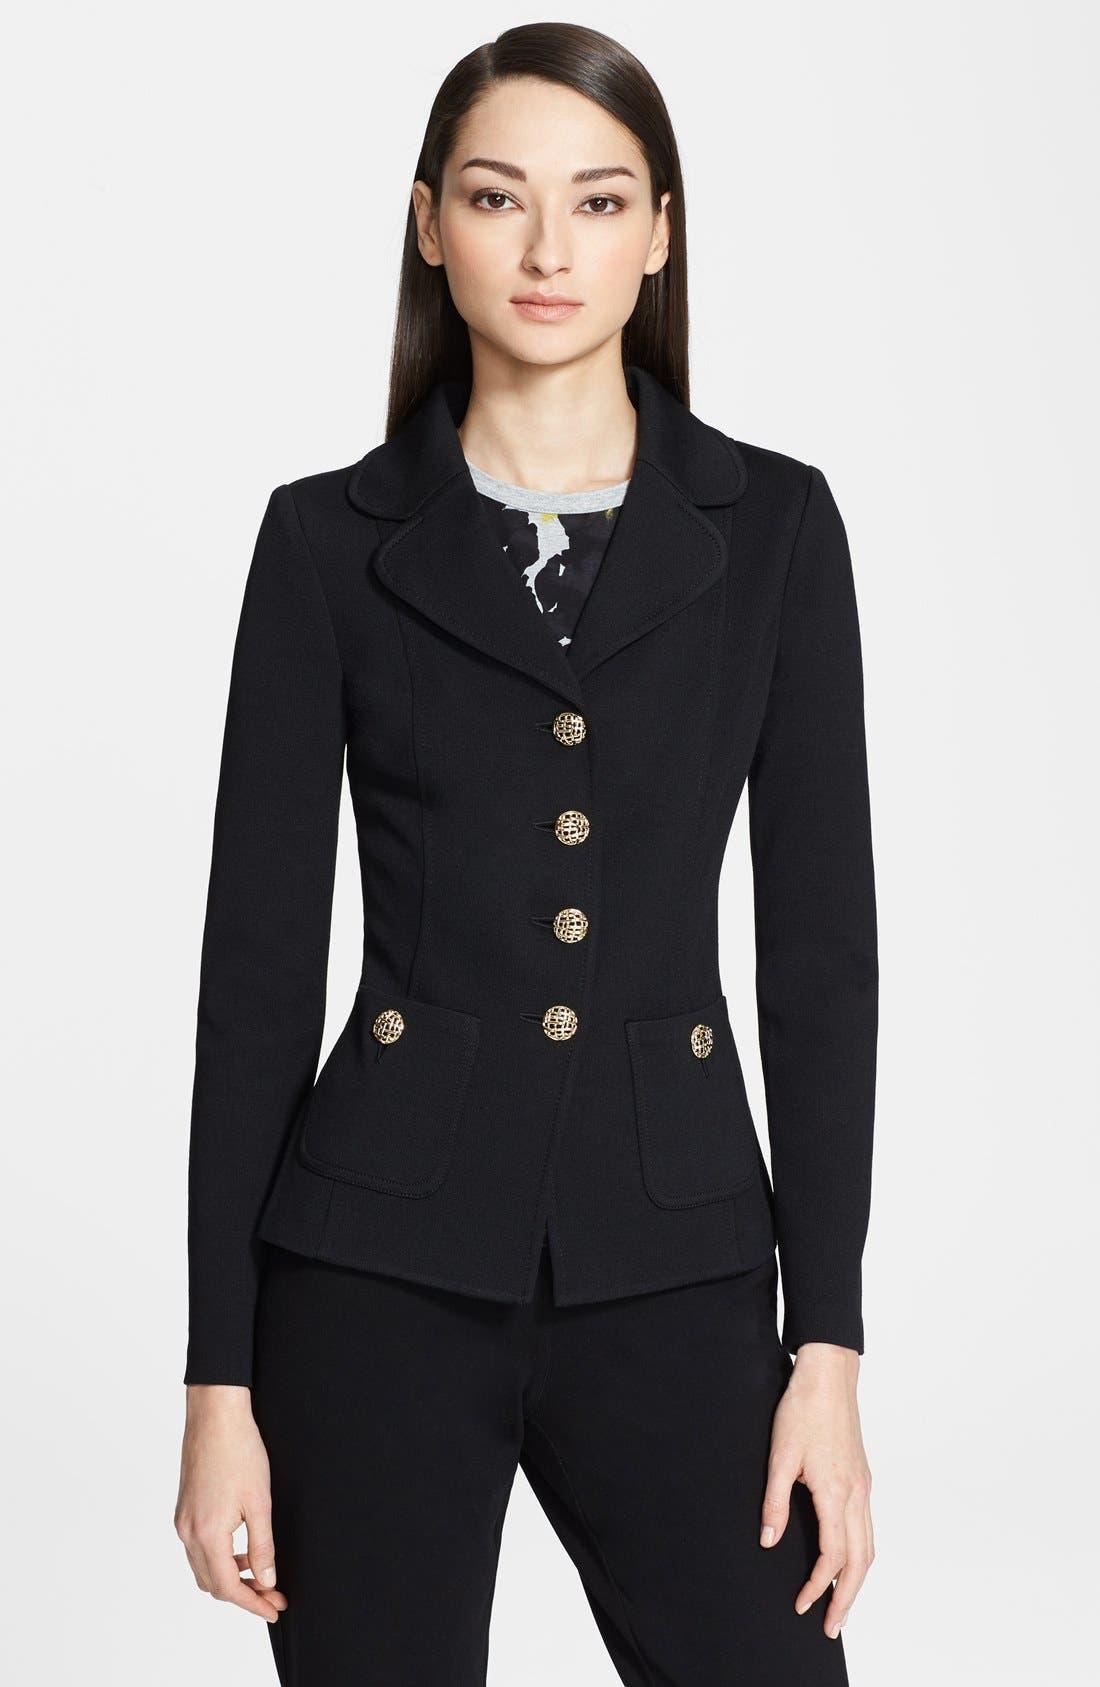 Main Image - St. John Collection Milano Knit Jacket